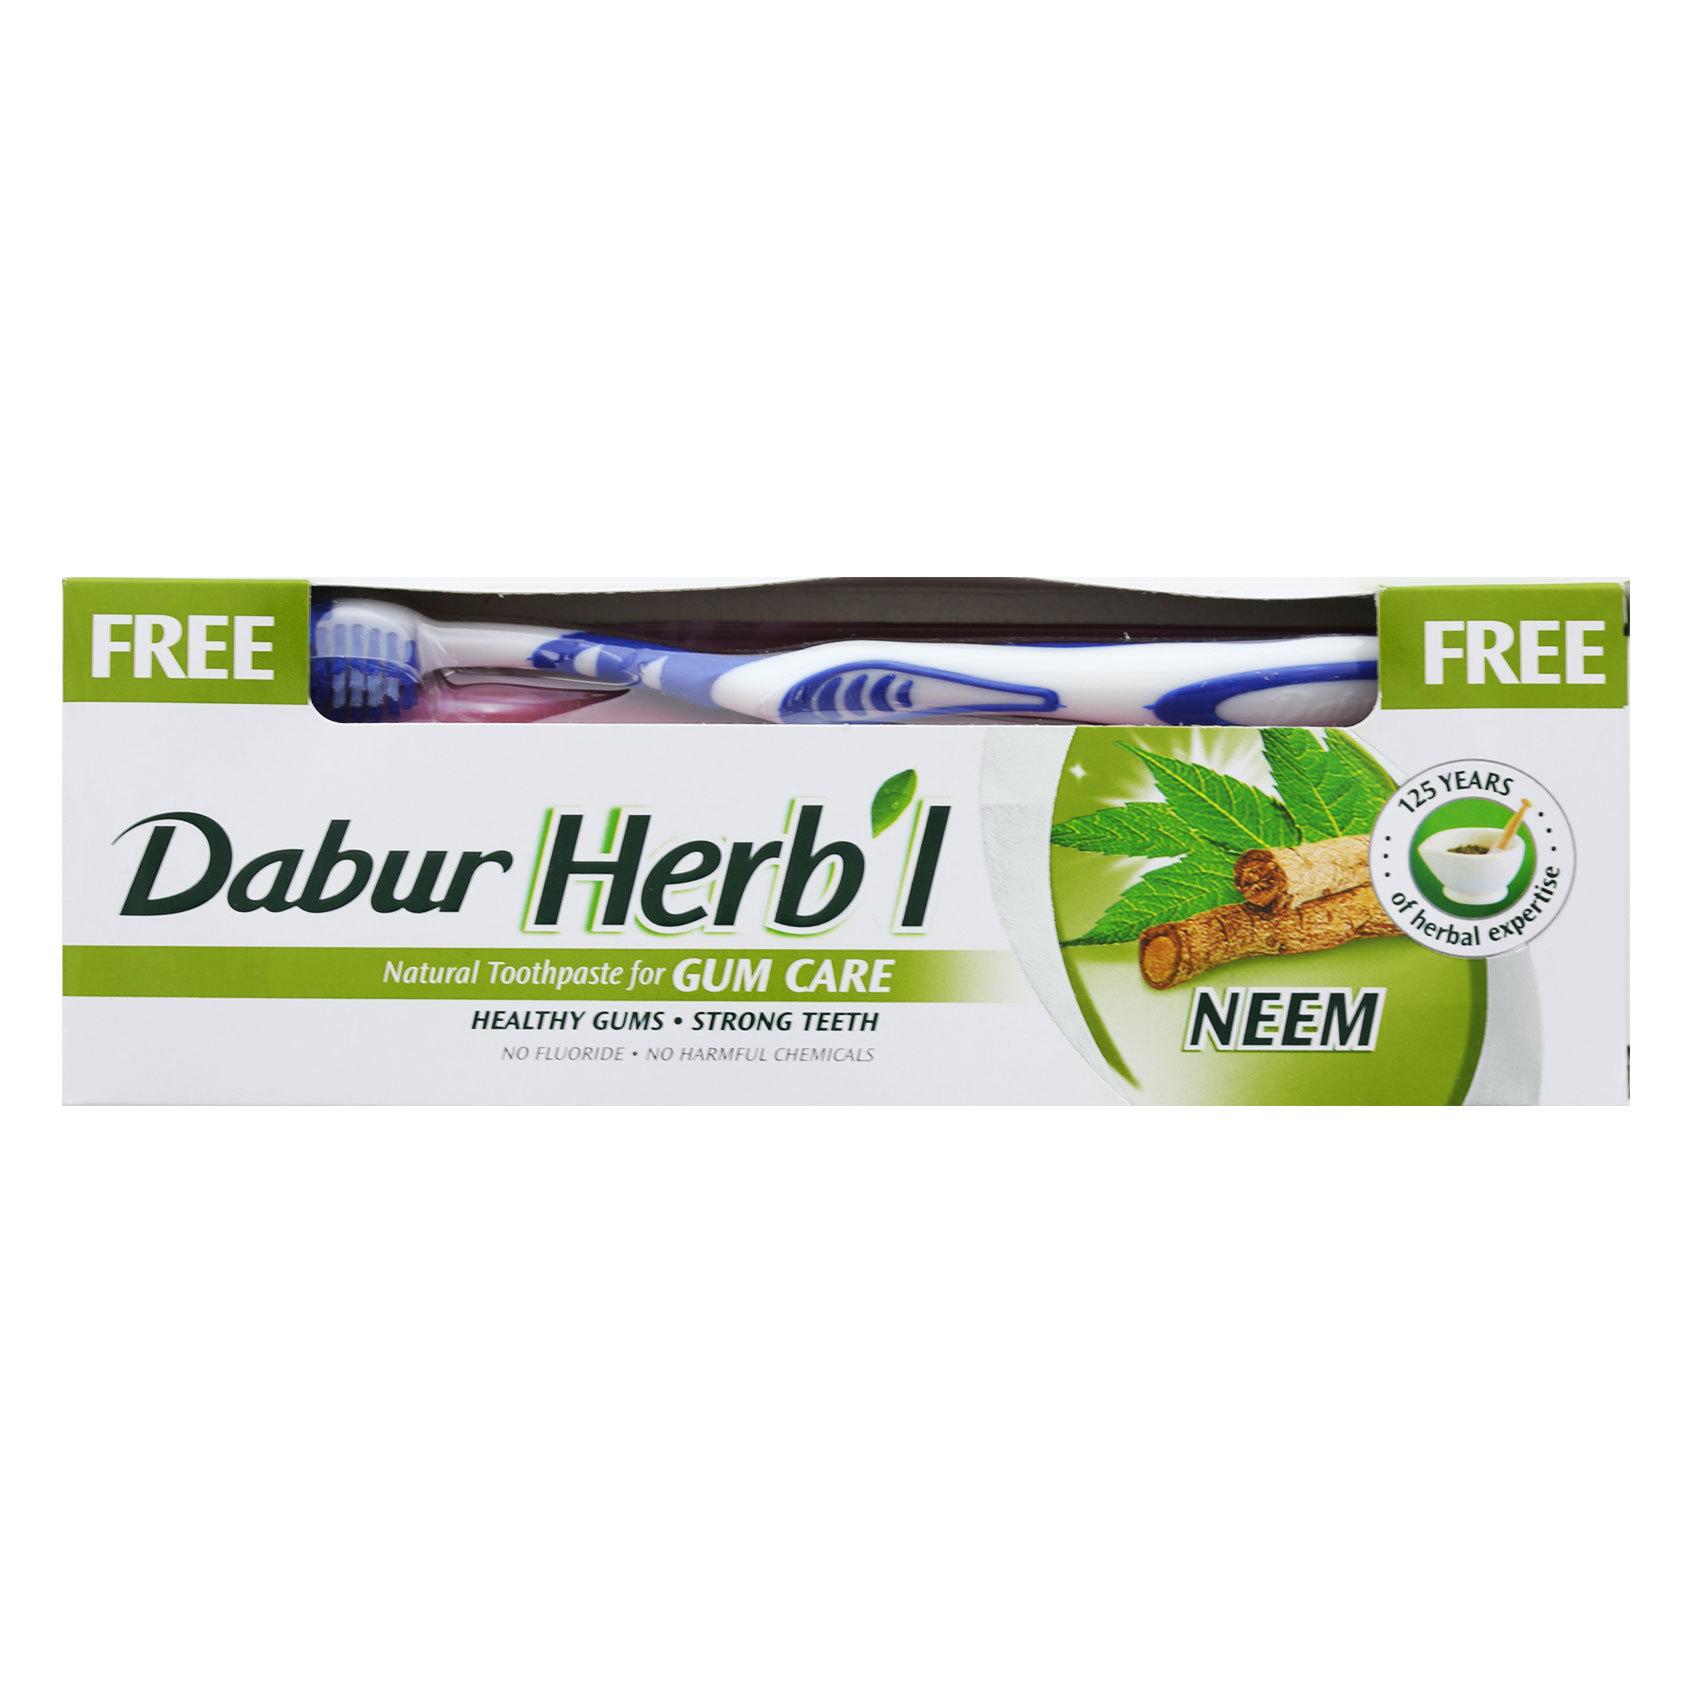 DABUR HERBAL NEEM 48X150G BRUSH FRE